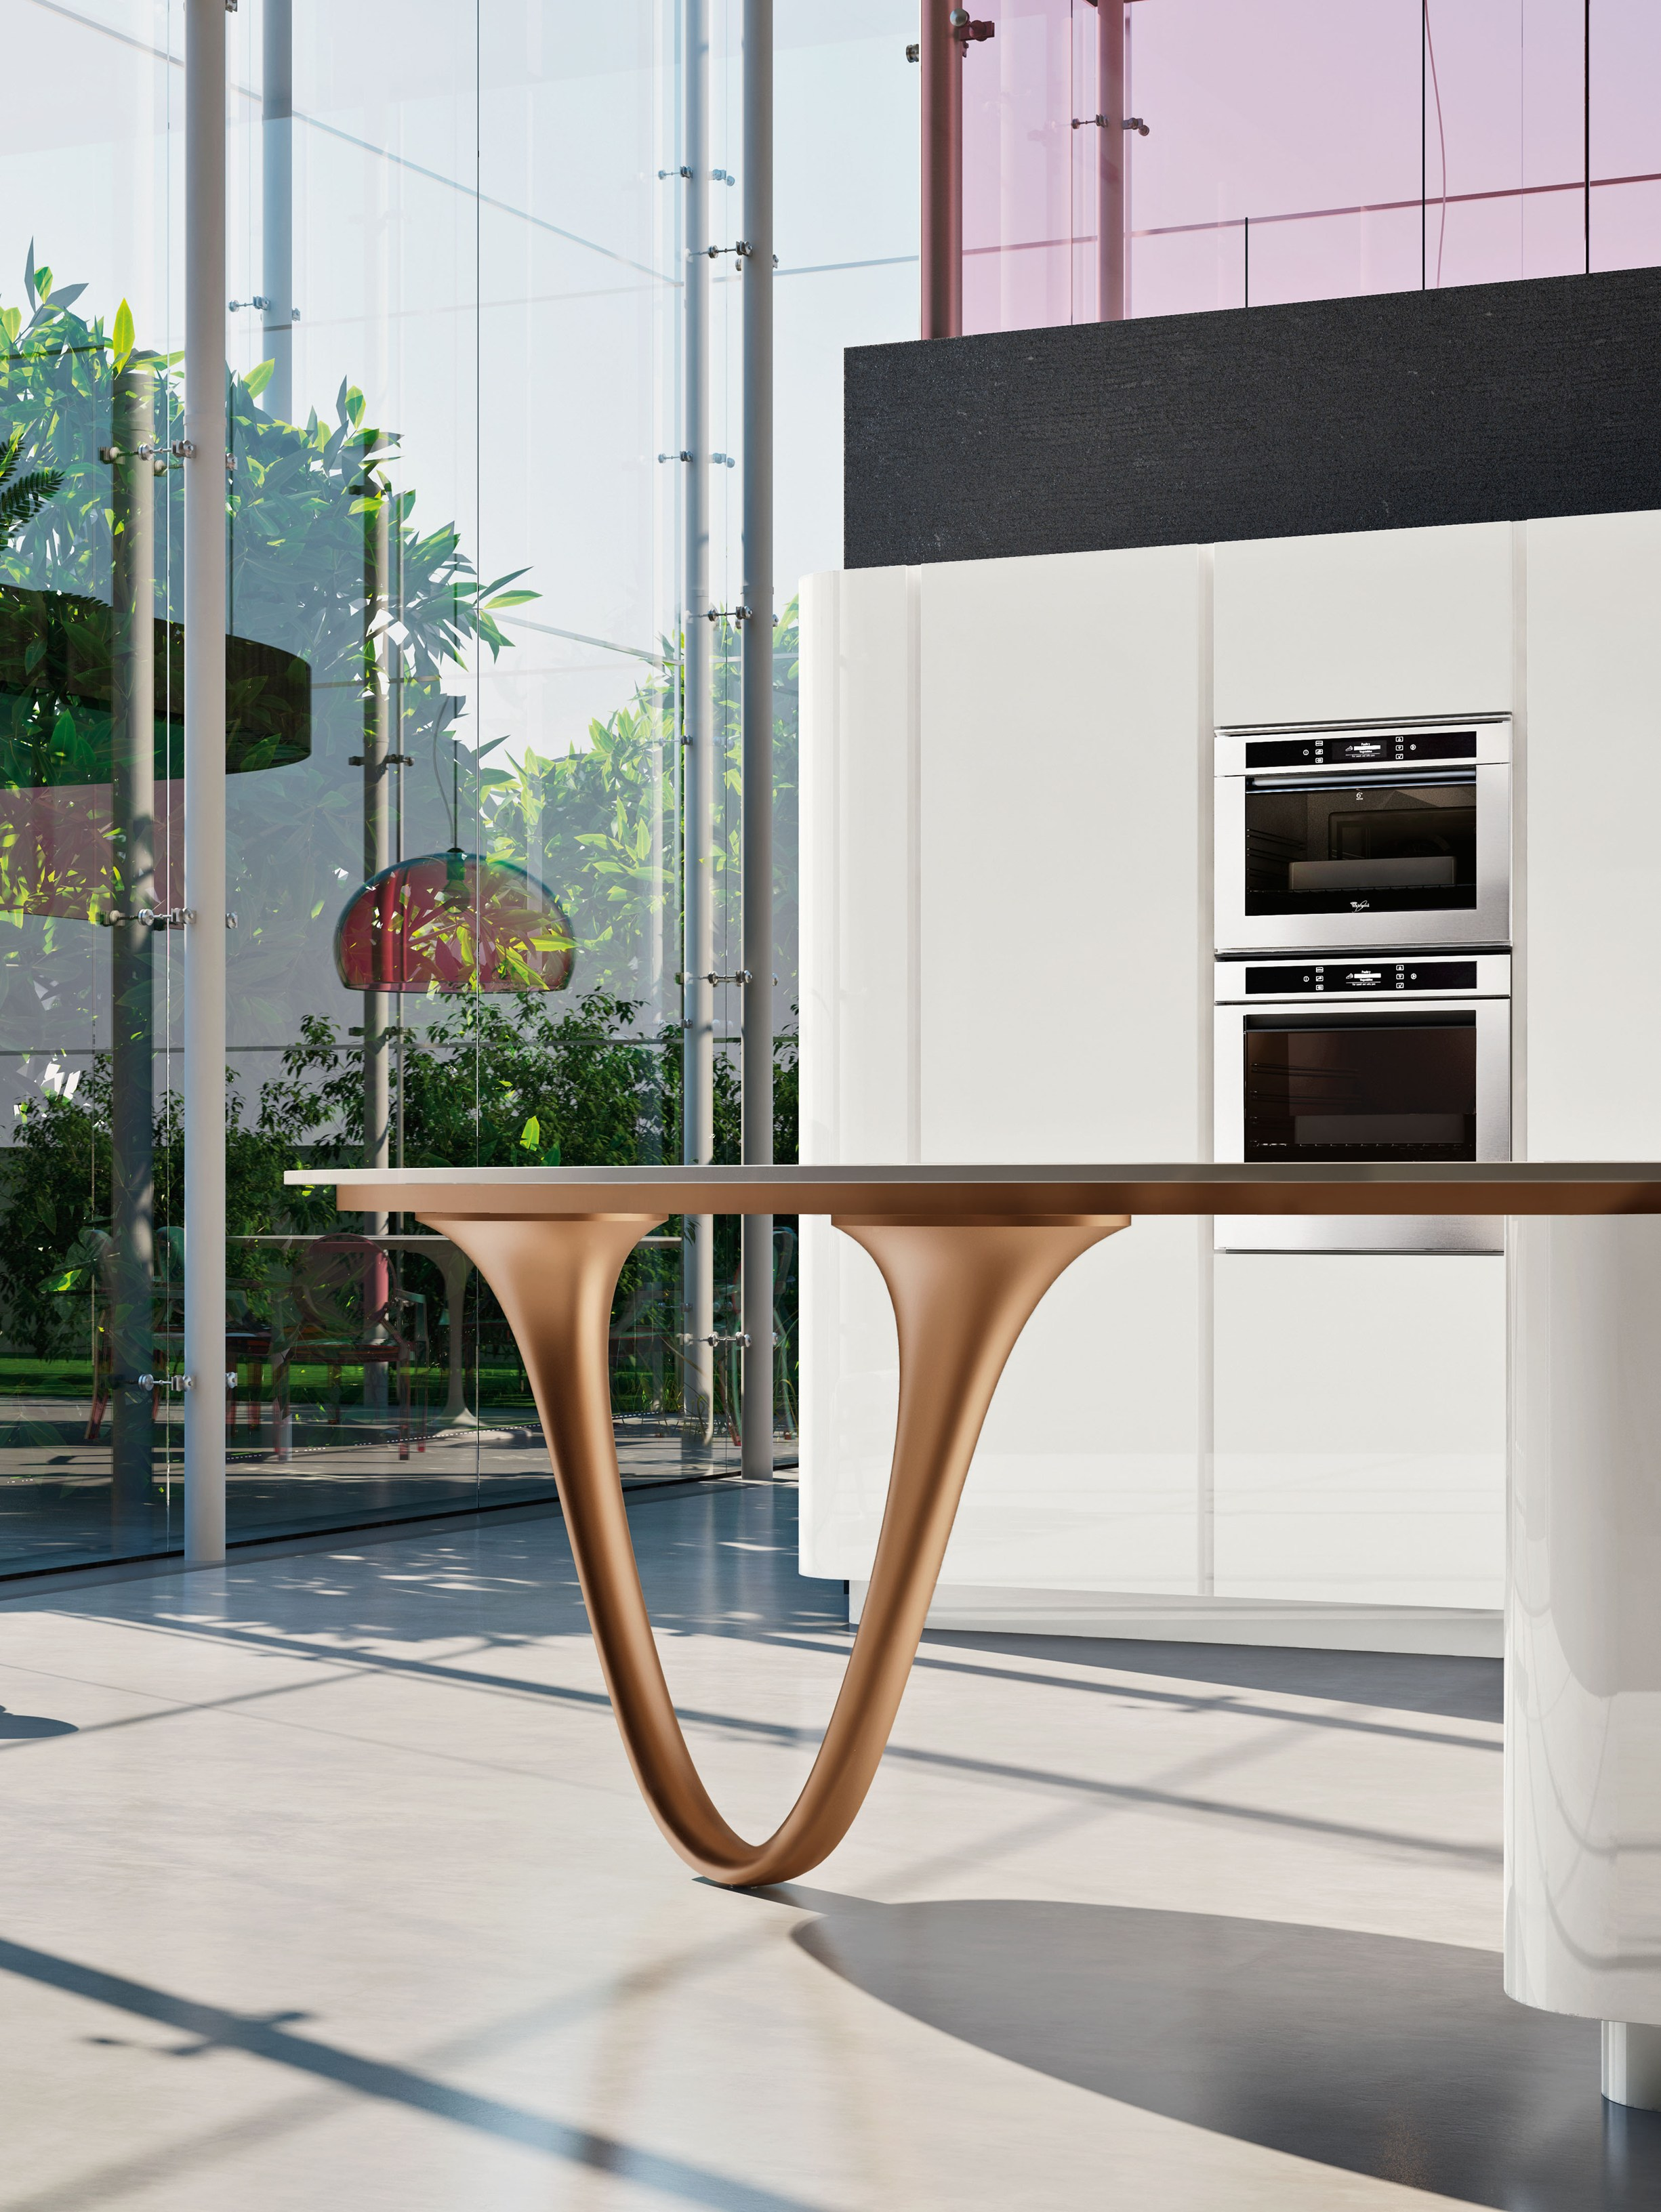 Schön OLA 25 | Küche Mit Halbinsel Kollektion ICONE By Snaidero Design  Pininfarina